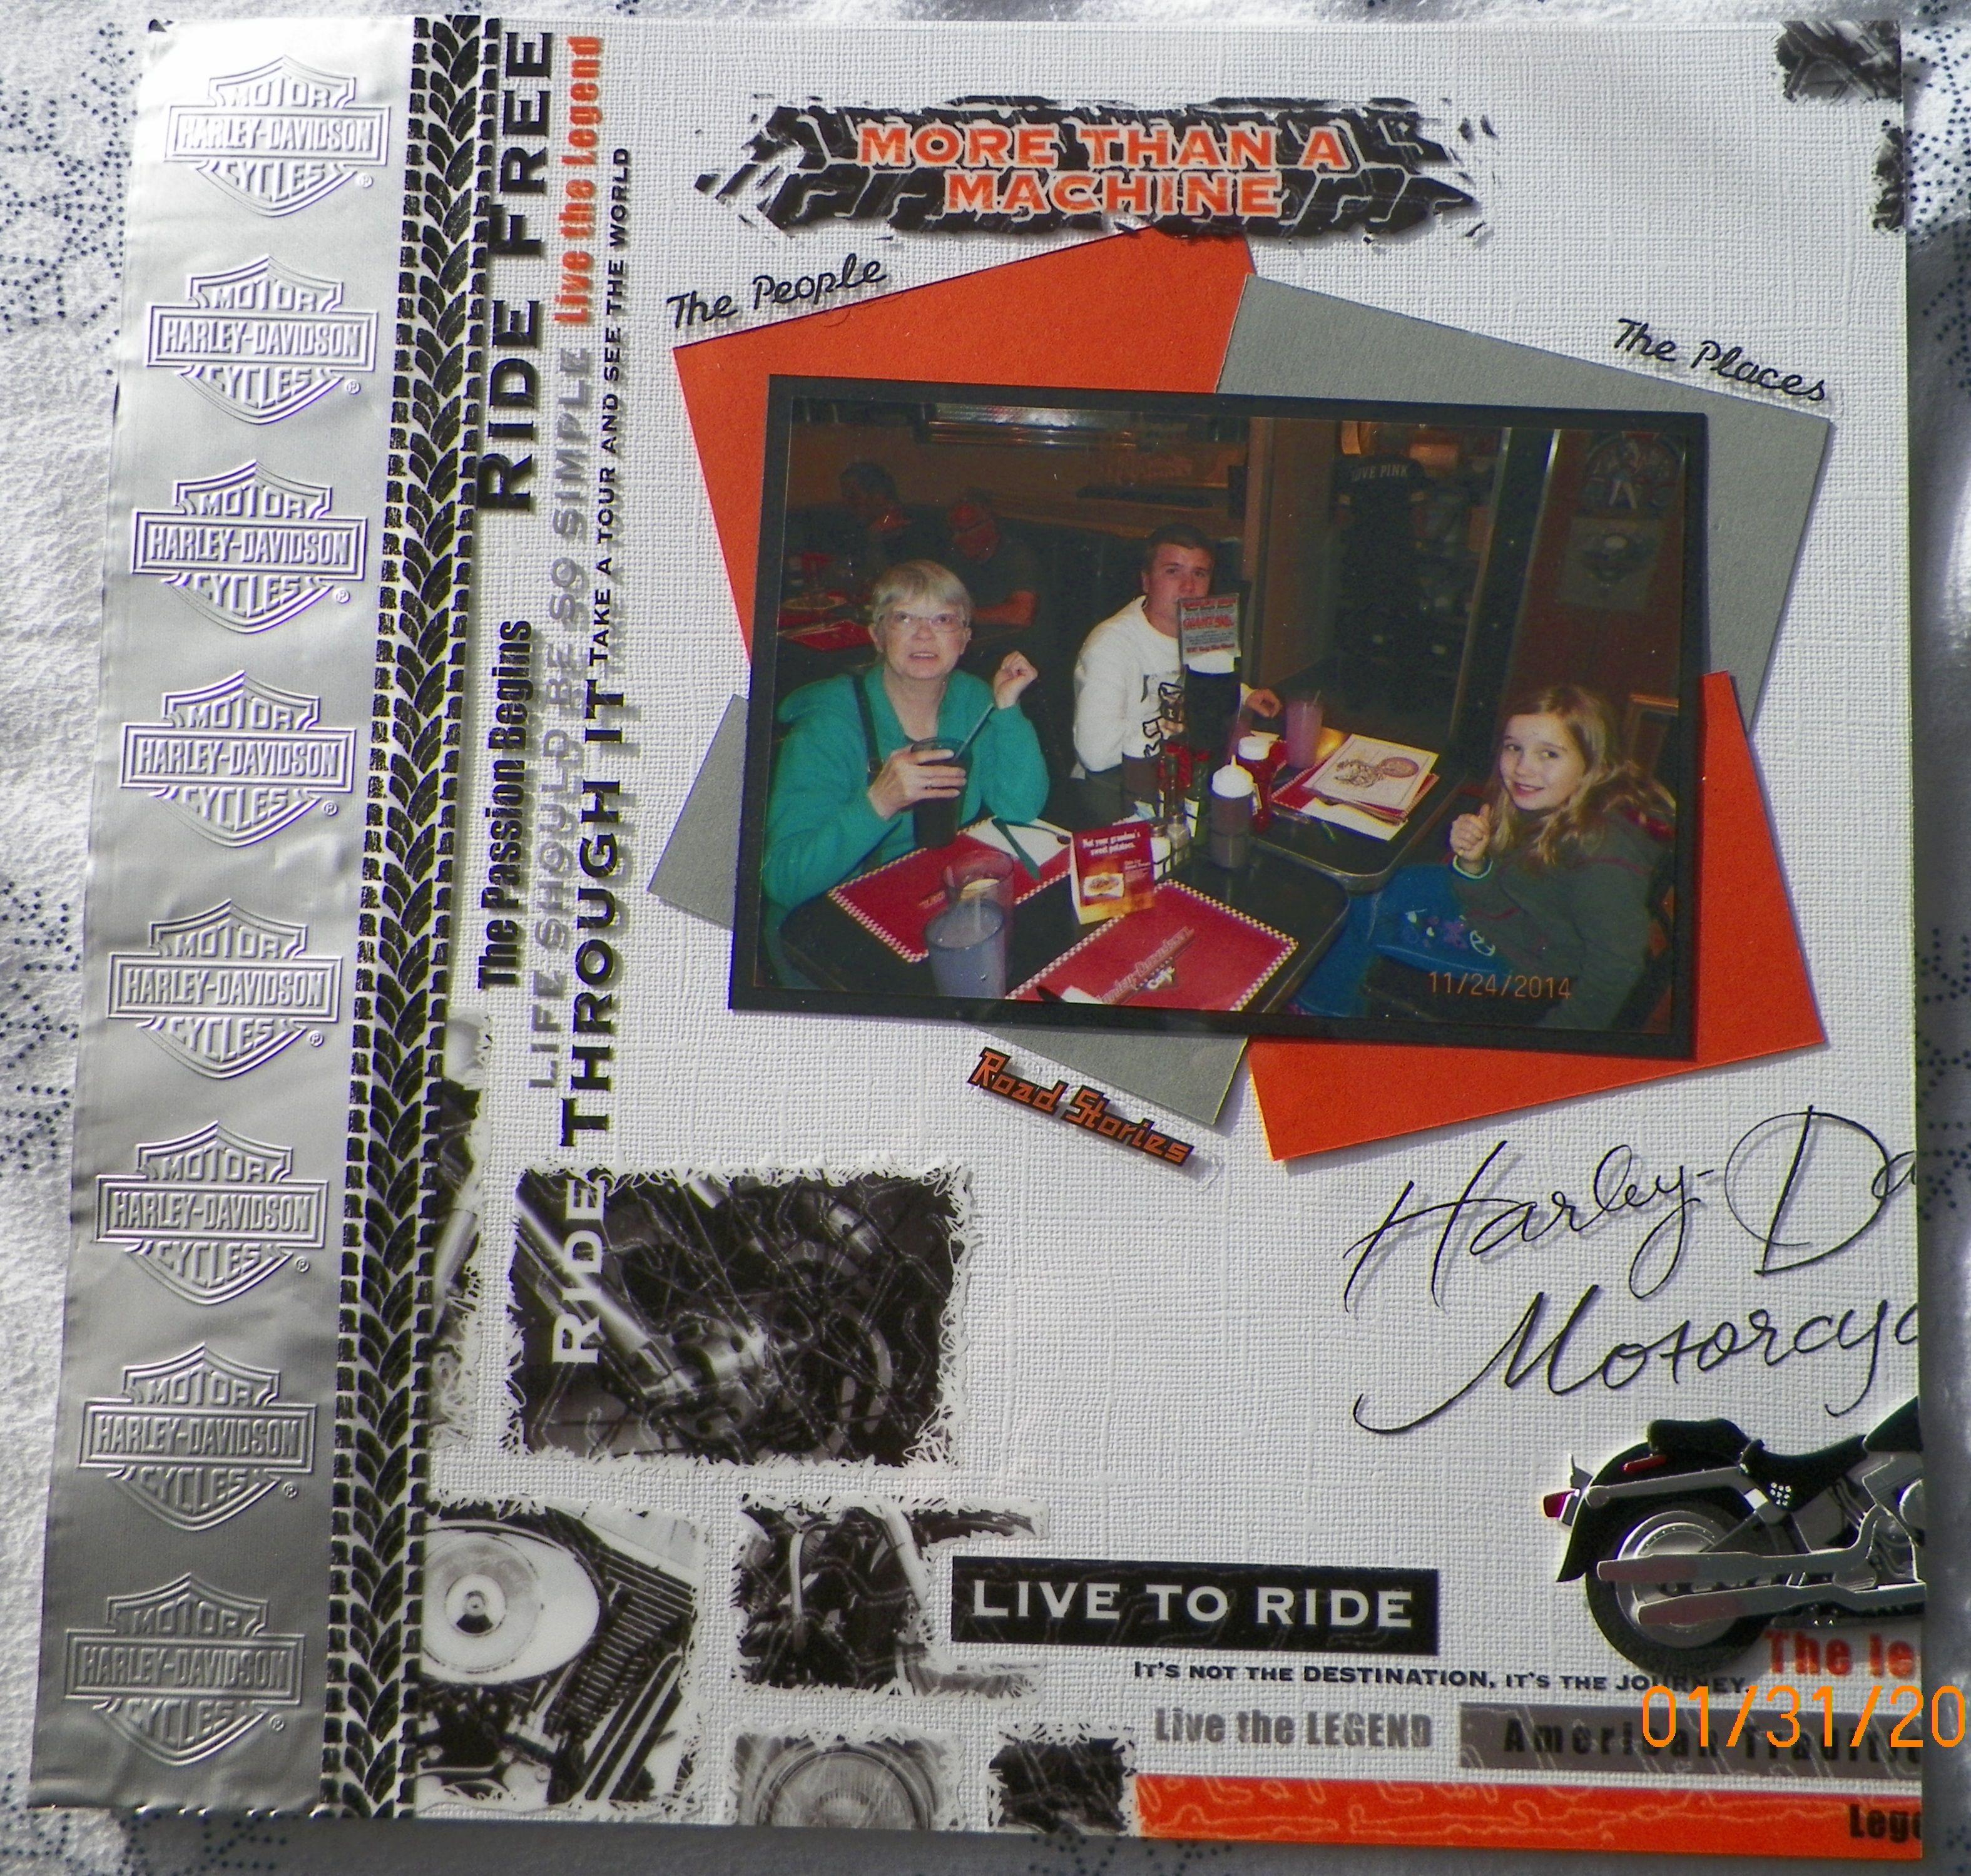 Scrapbook ideas las vegas - Handmade Scrapbook Layout Pg 1 Ek Success Harley Davidson Las Vegas